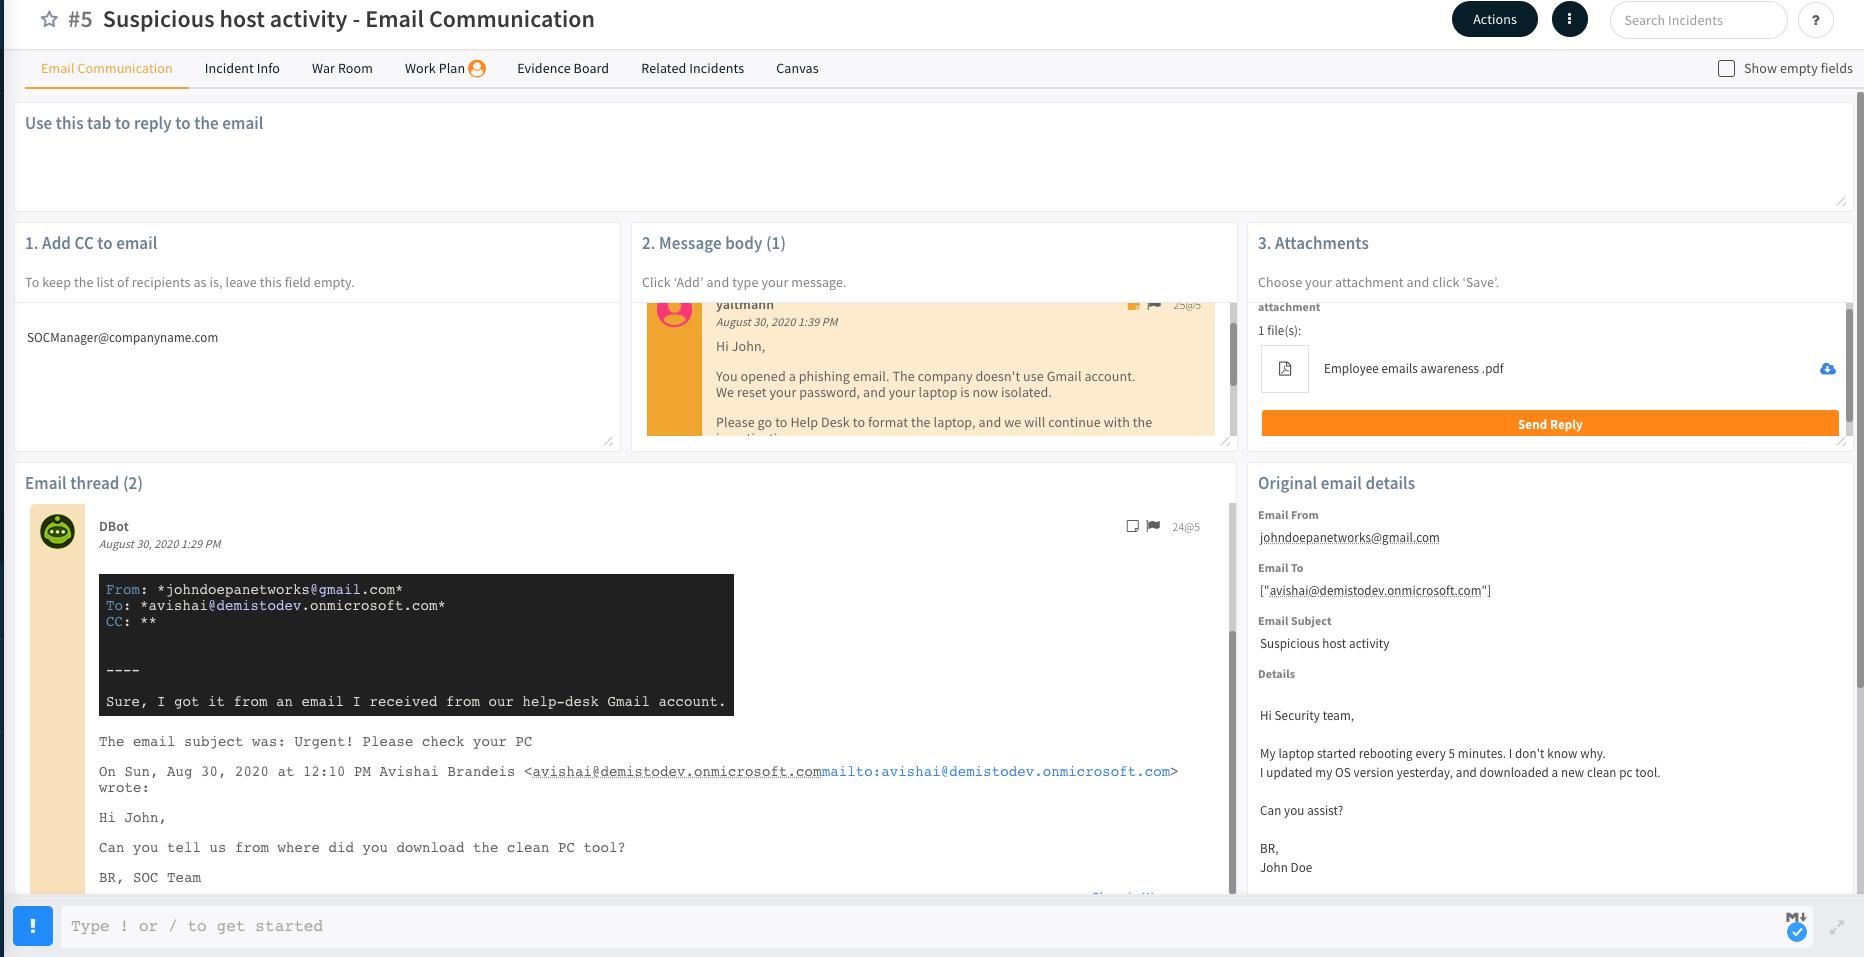 Email_Communication_layout